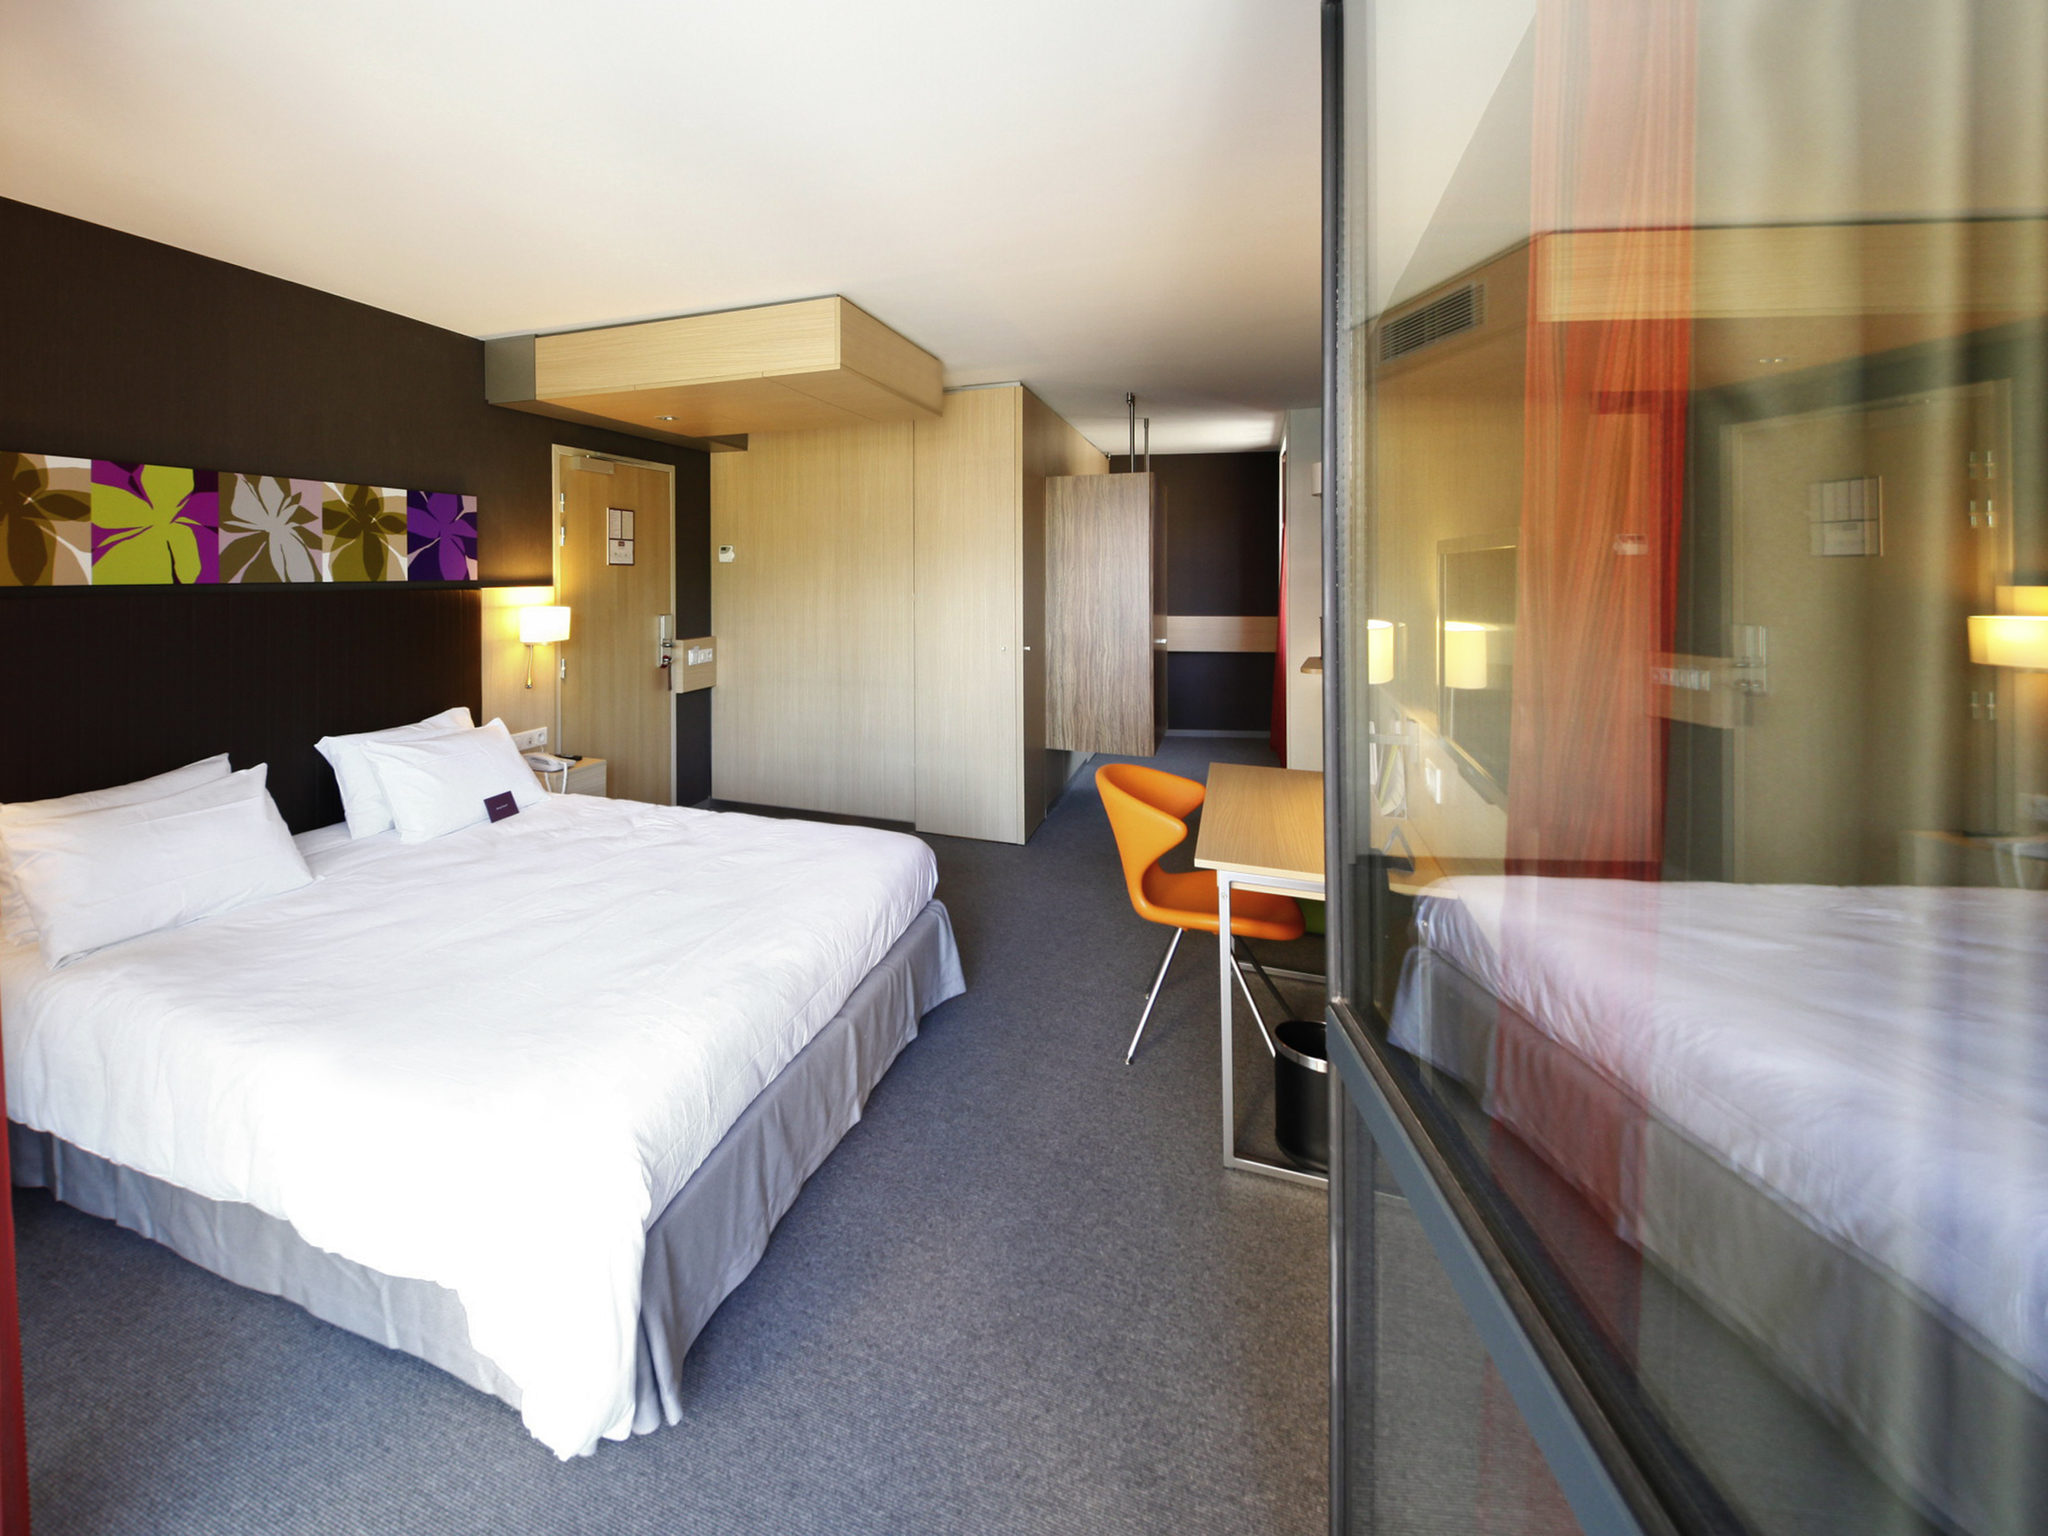 Hotell – Hôtel Mercure Valenciennes Centre